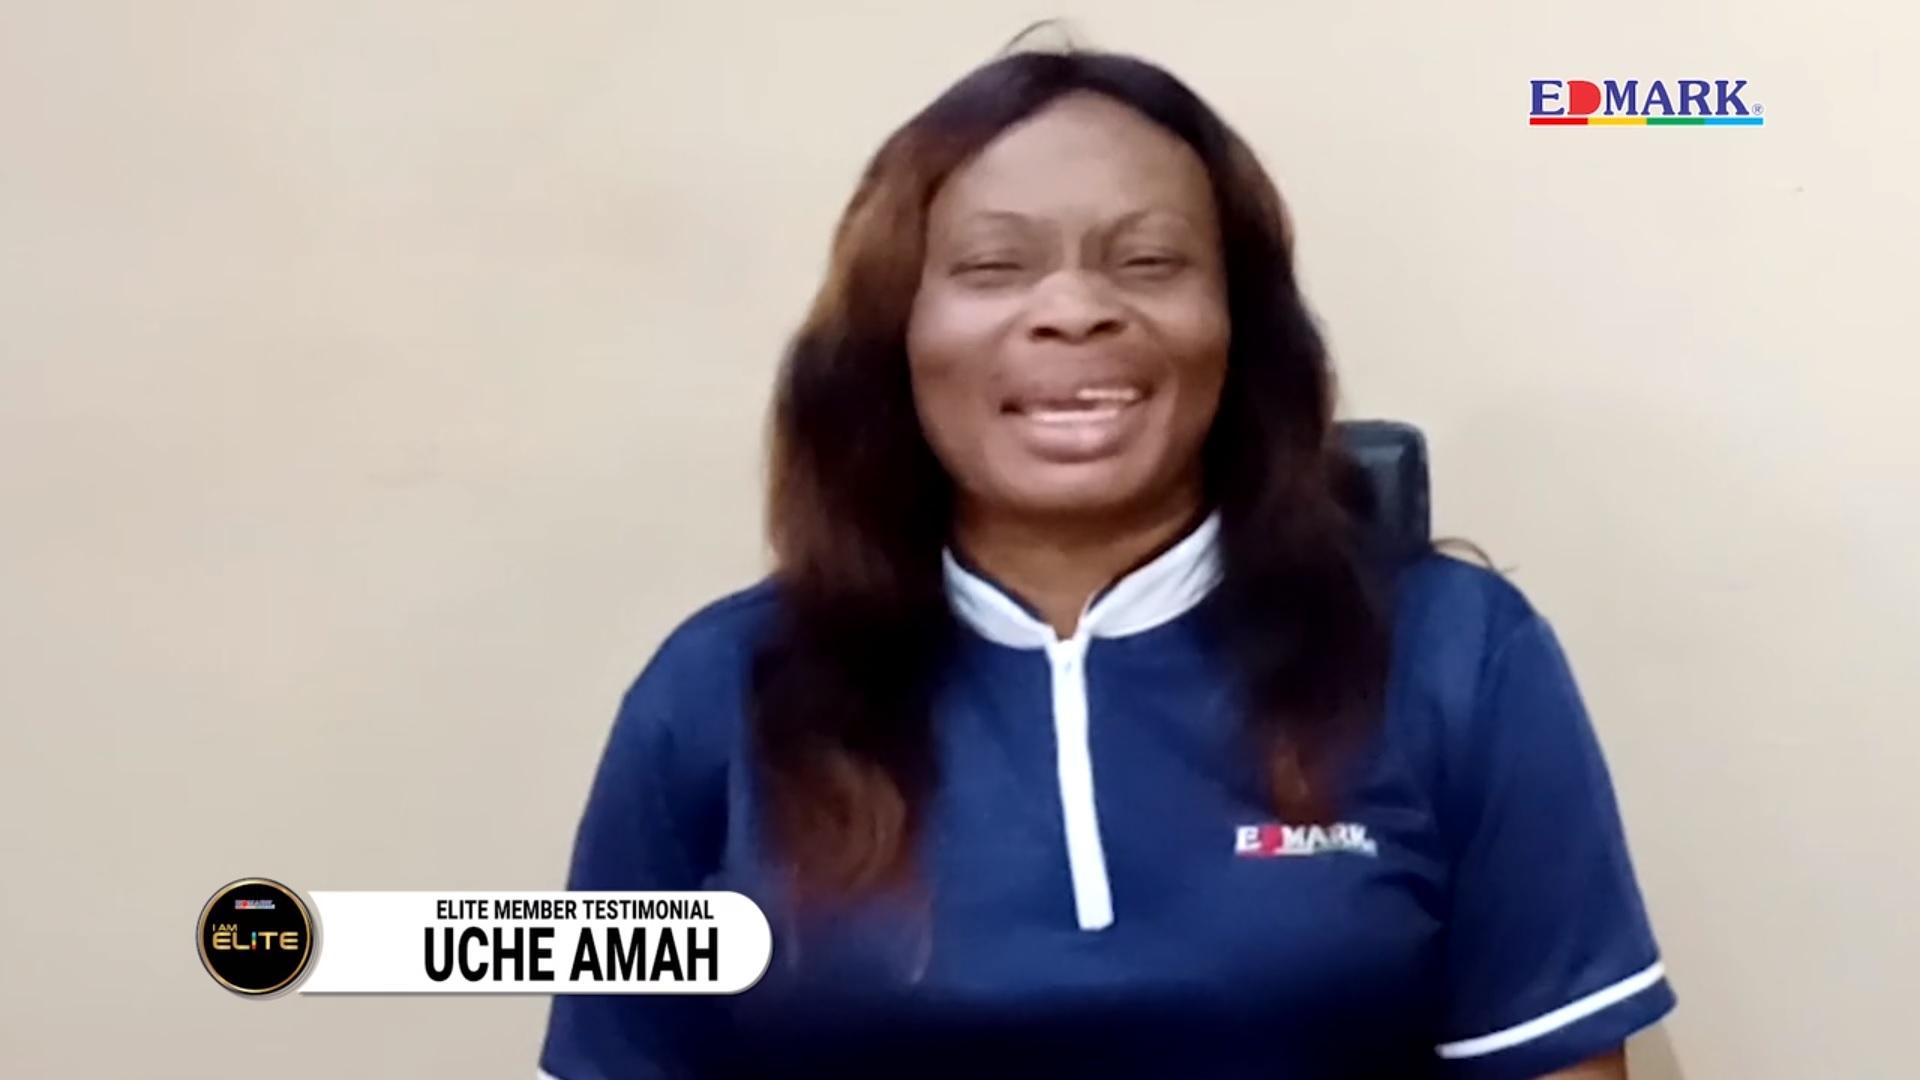 Elite Testimonial – DCM Uche Amah